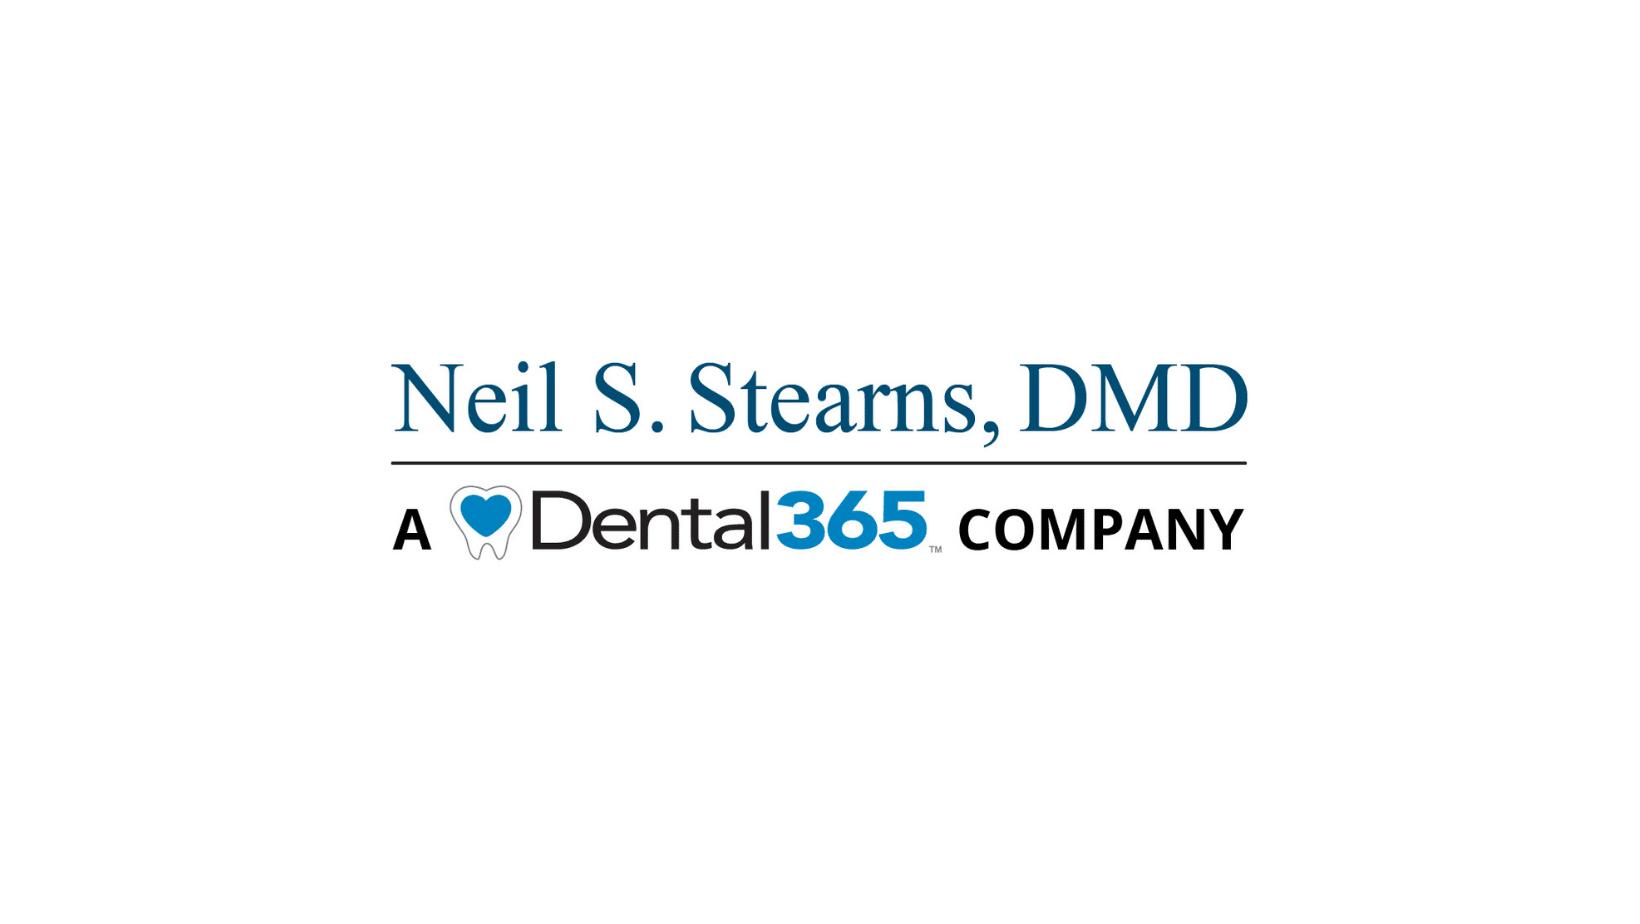 Neil S. Stearns, DMD - A Dental365 Company logo